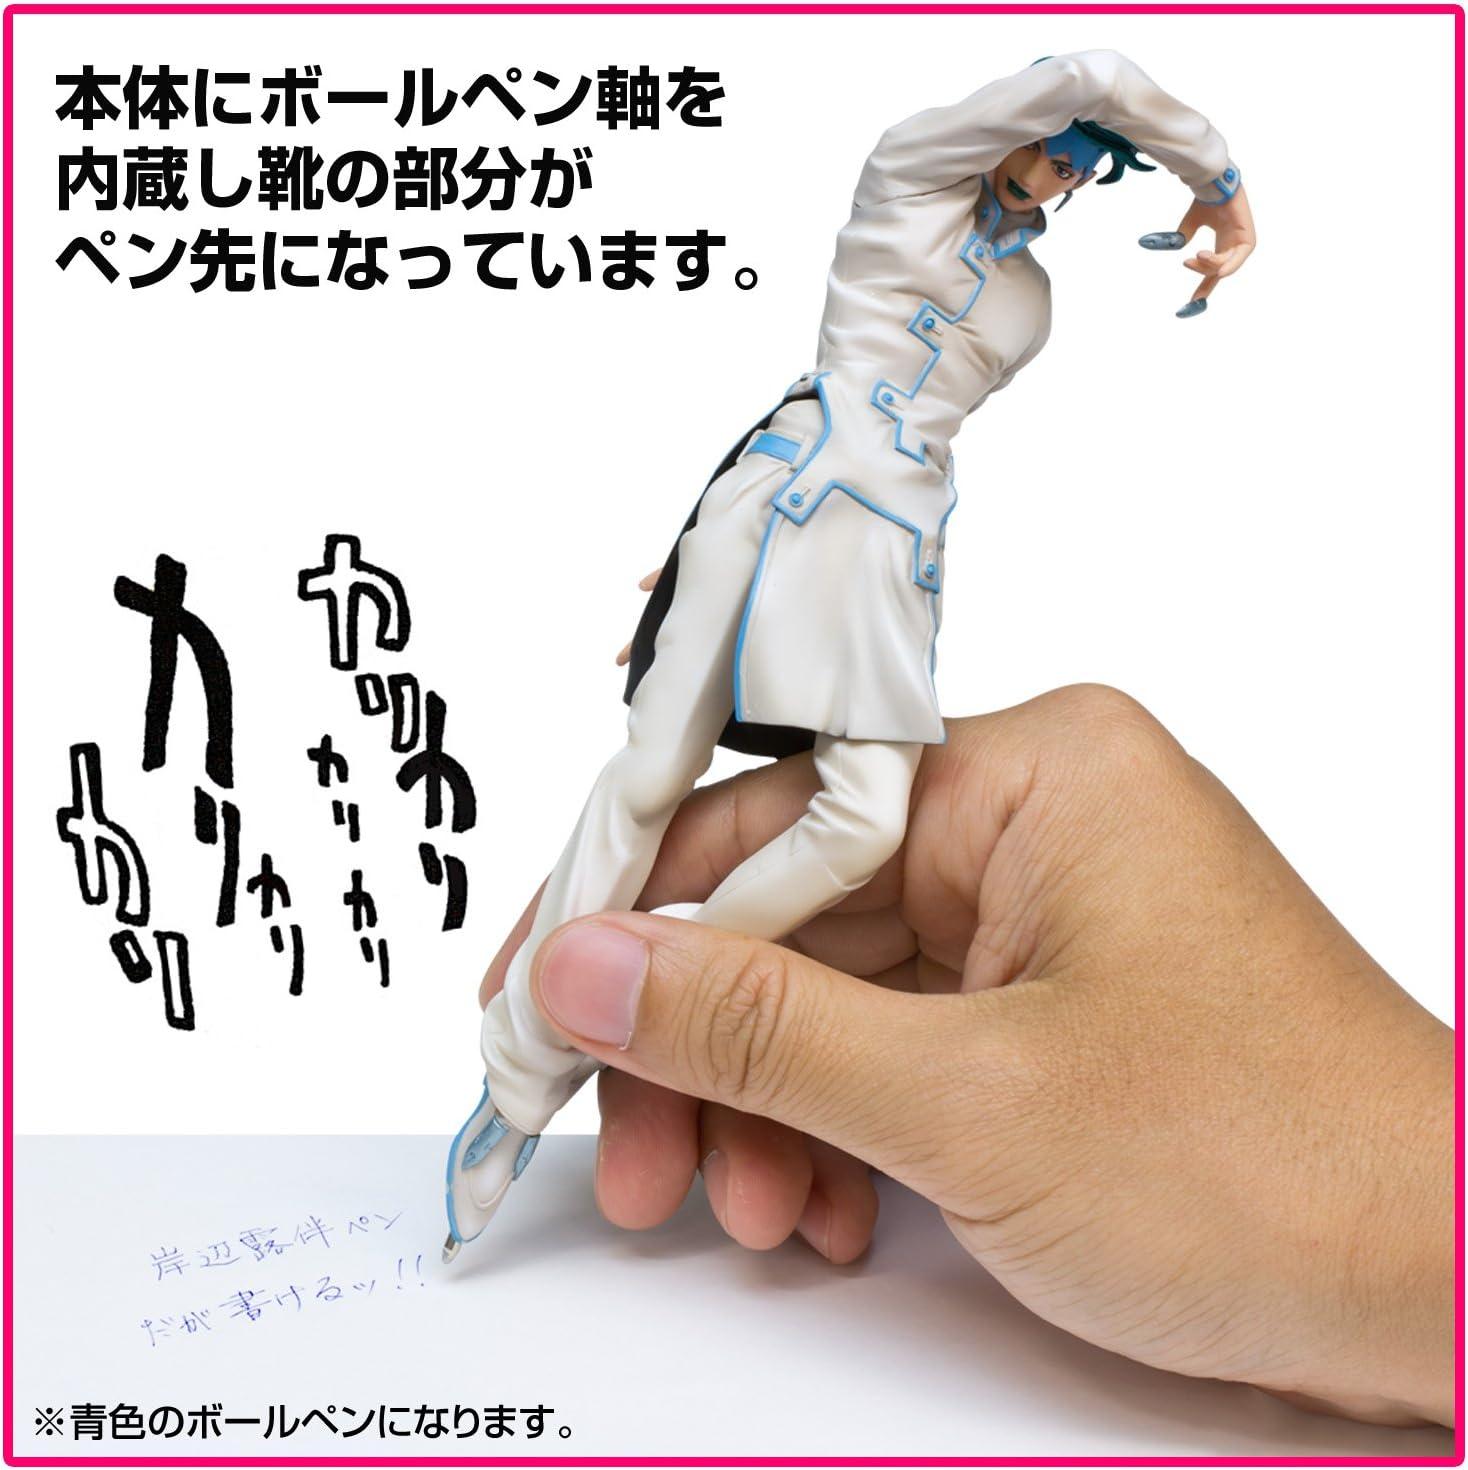 Anime JoJo/'s Bizarre Adventure Rohan Kishibe Metal Fountain Pen Ink Set Gift